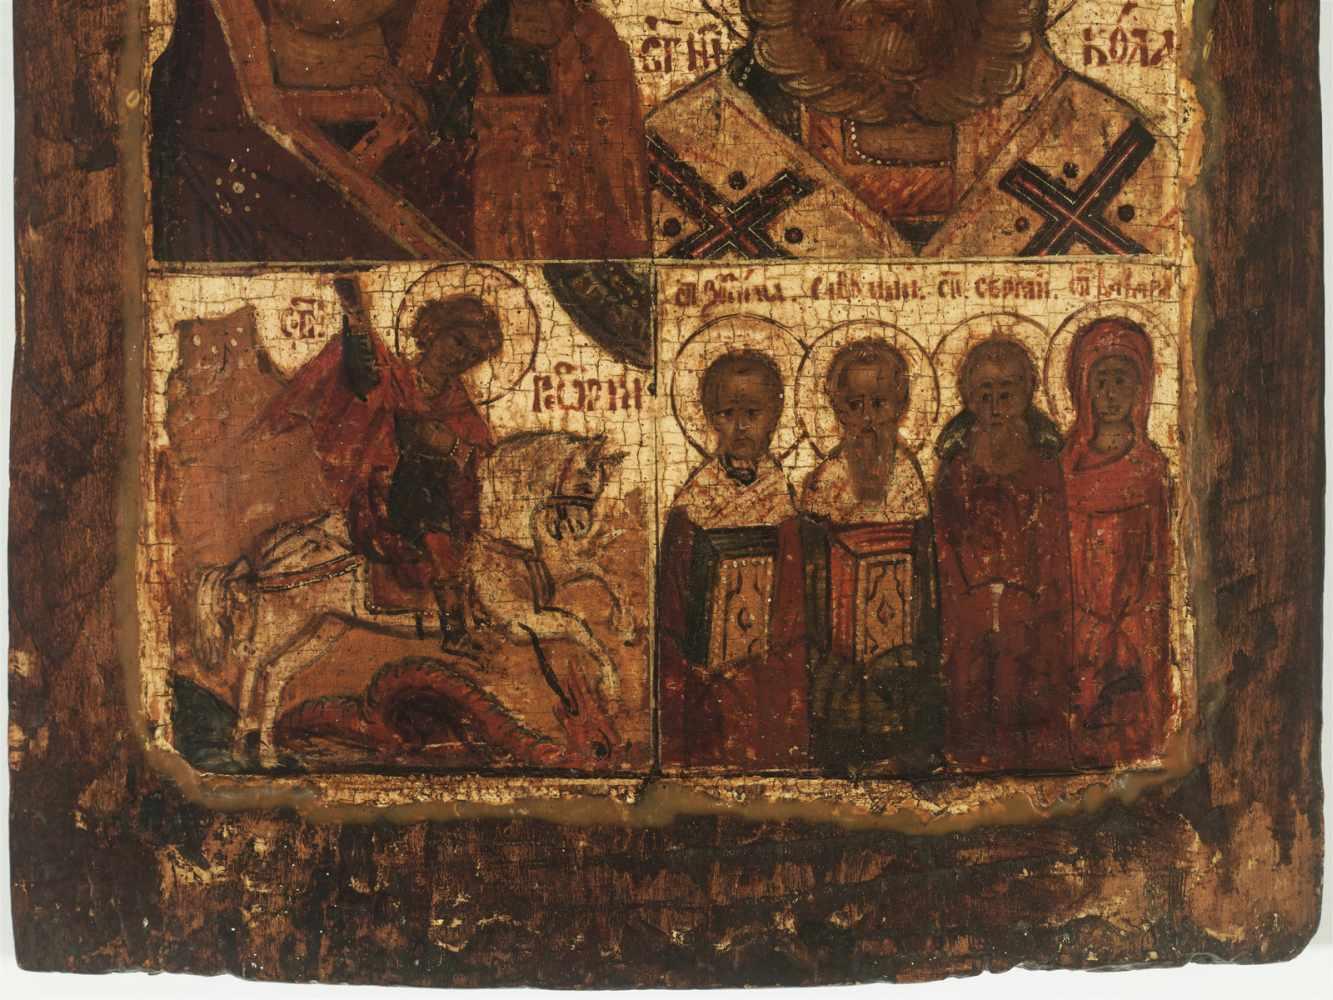 QUADRIPARTITE ICON WITH MARY AND JESUS, SAINTS NICOLAS AND GEORGE, 19th CENTURYWood, polychrome - Image 3 of 4